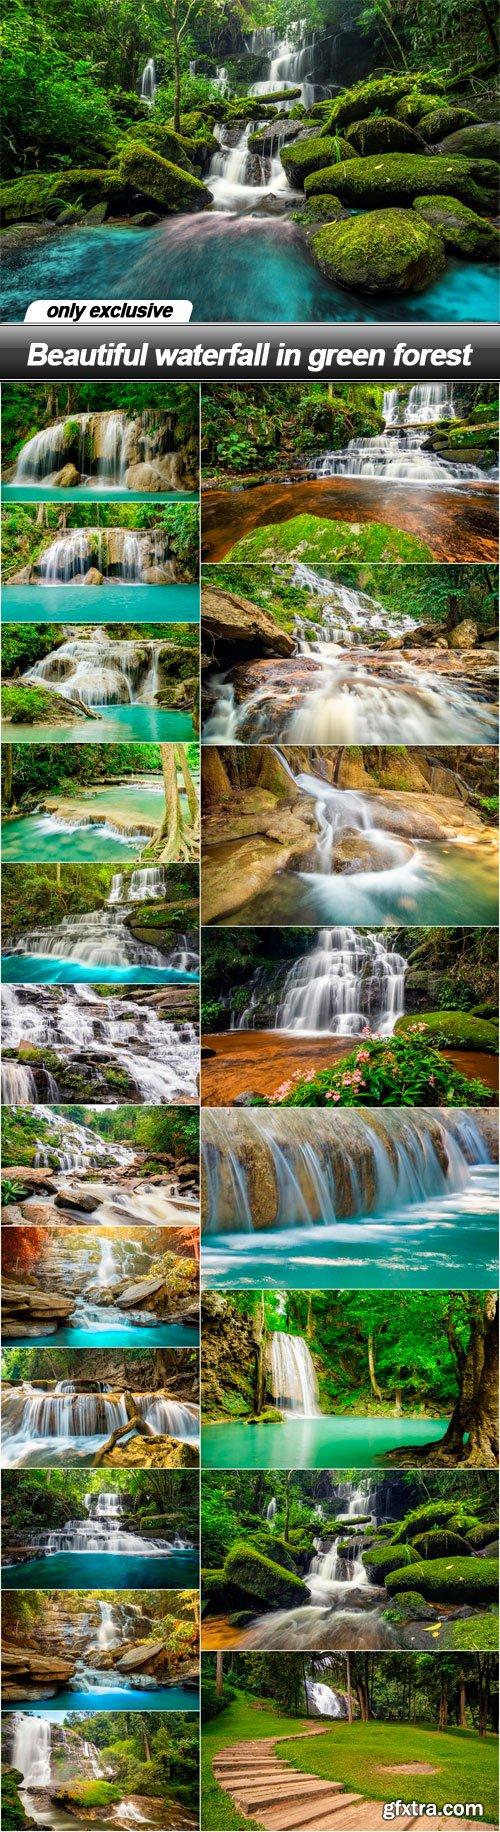 Beautiful waterfall in green forest - 21 UHQ JPEG